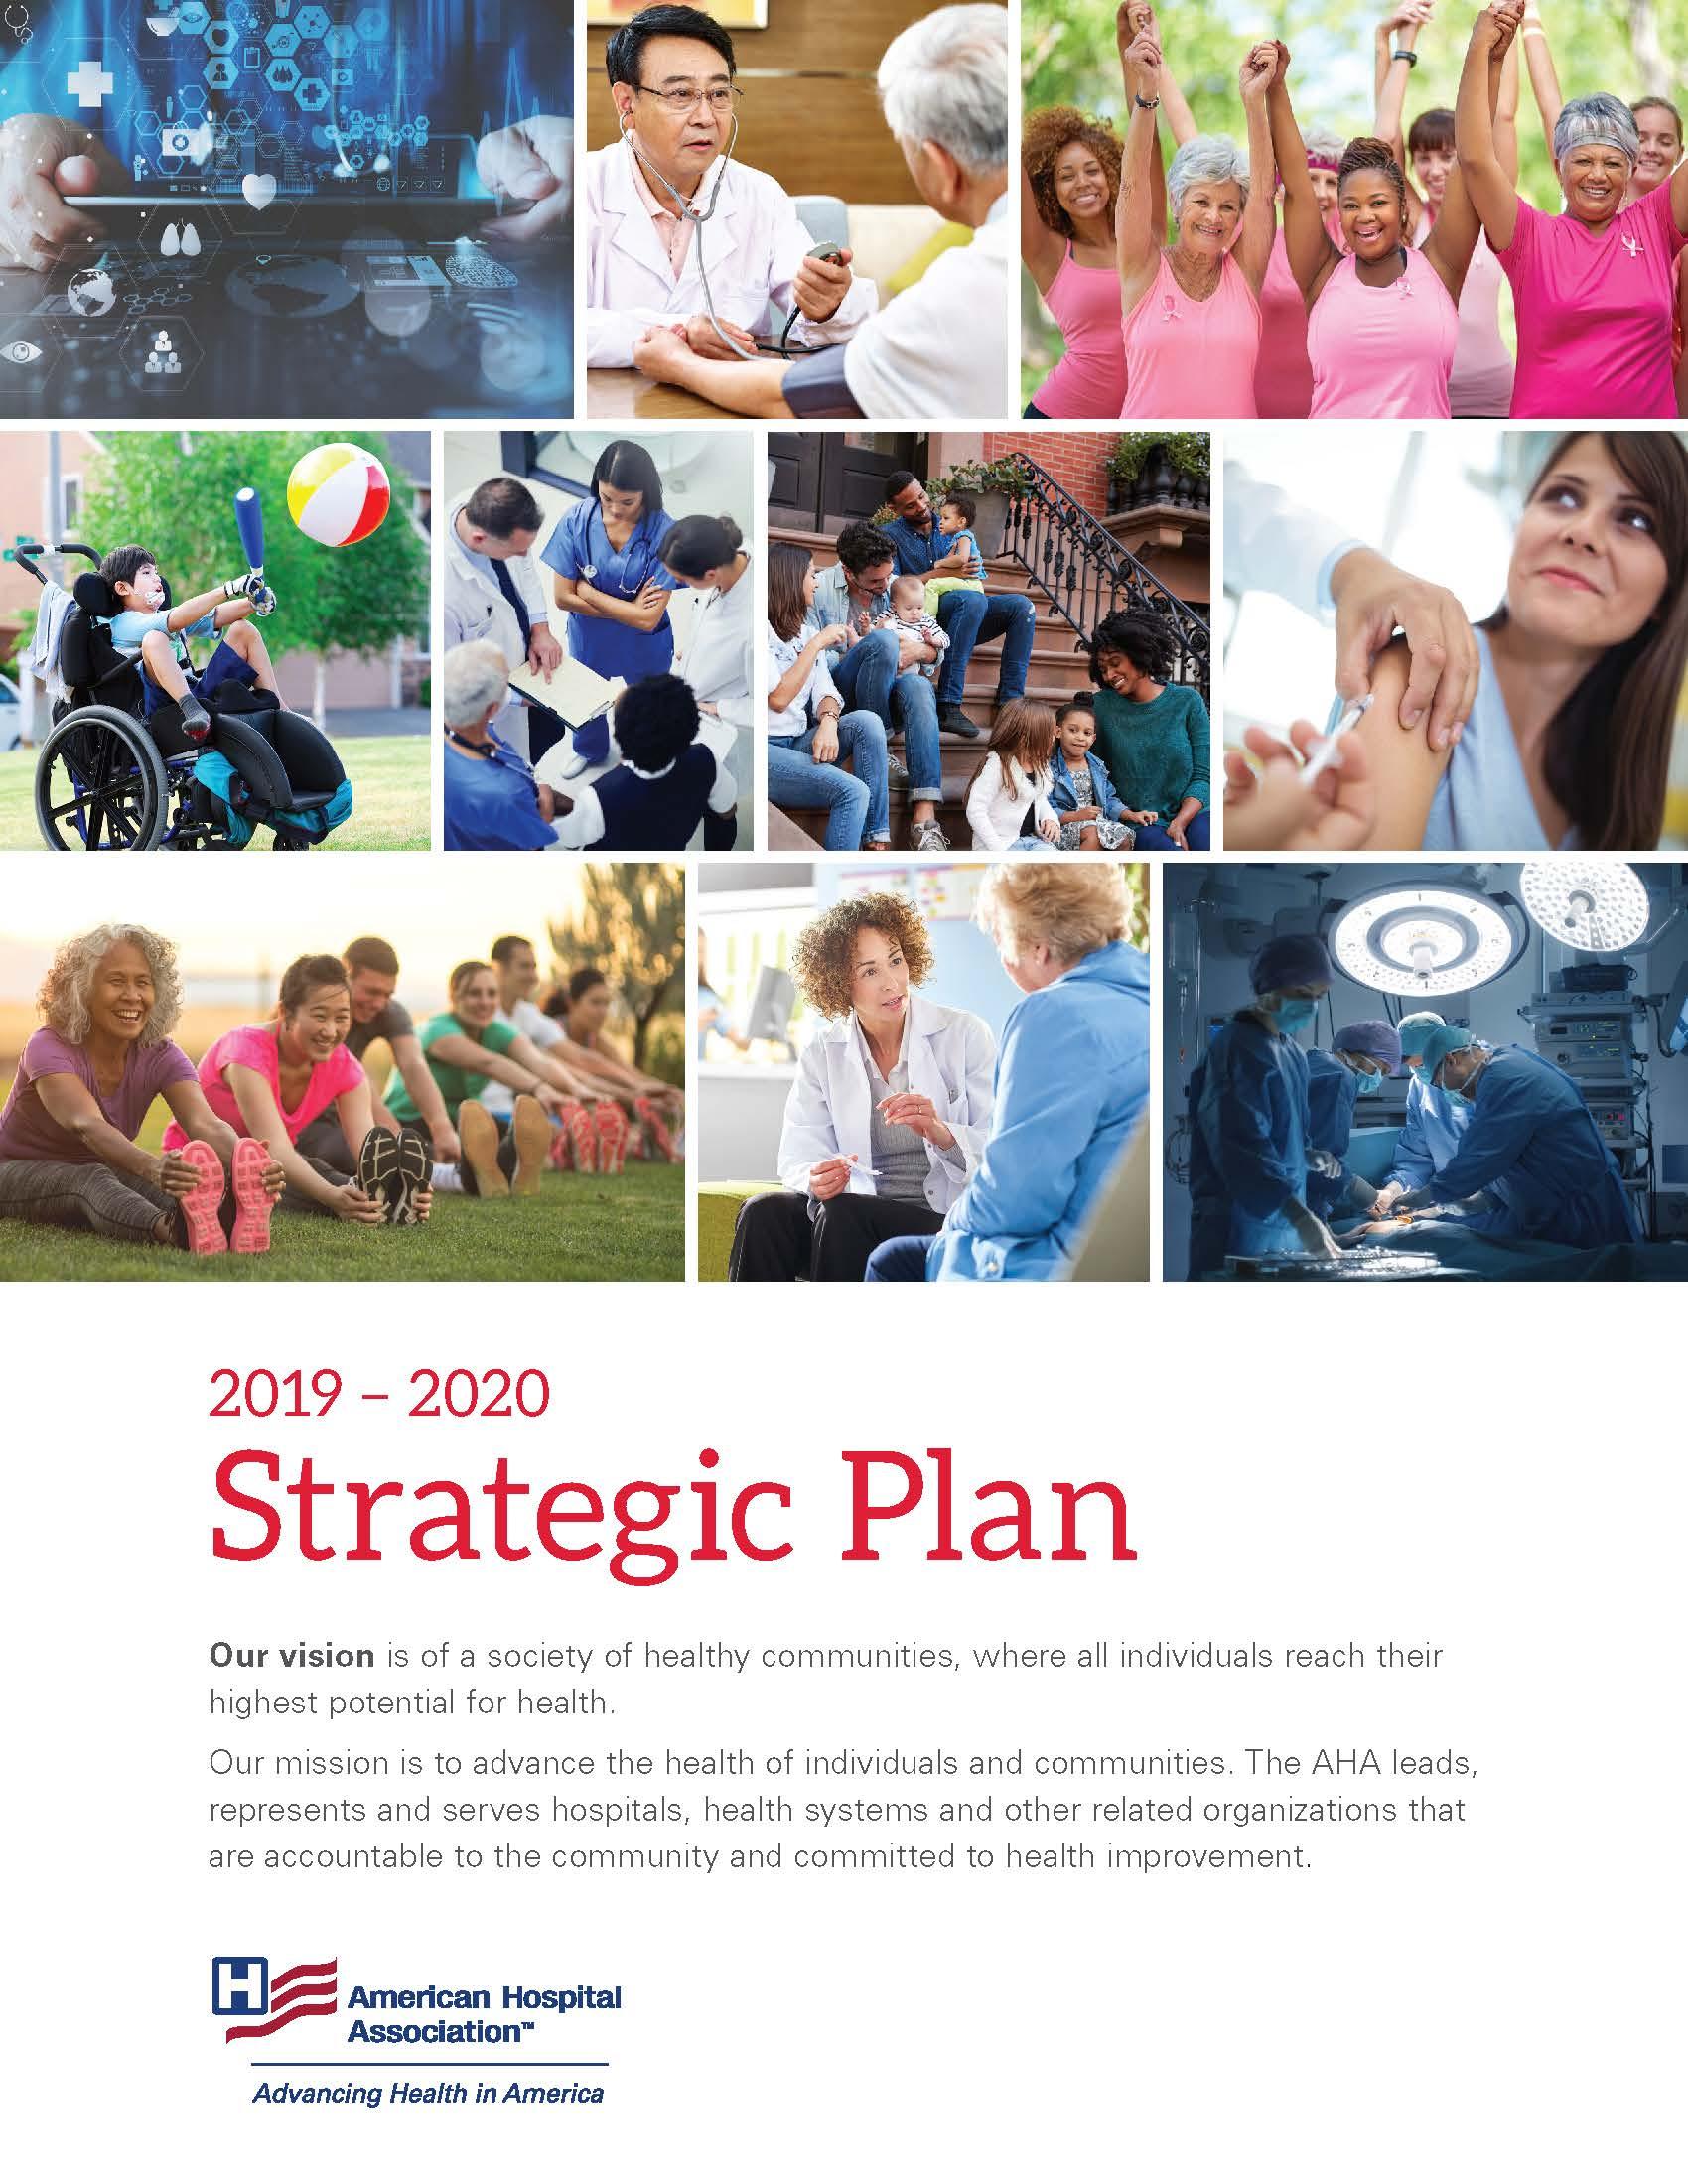 Relief Society Lesson November 2020 Ideas For Missionary Work AHA Strategic Plan 2019 – 2020 | AHA